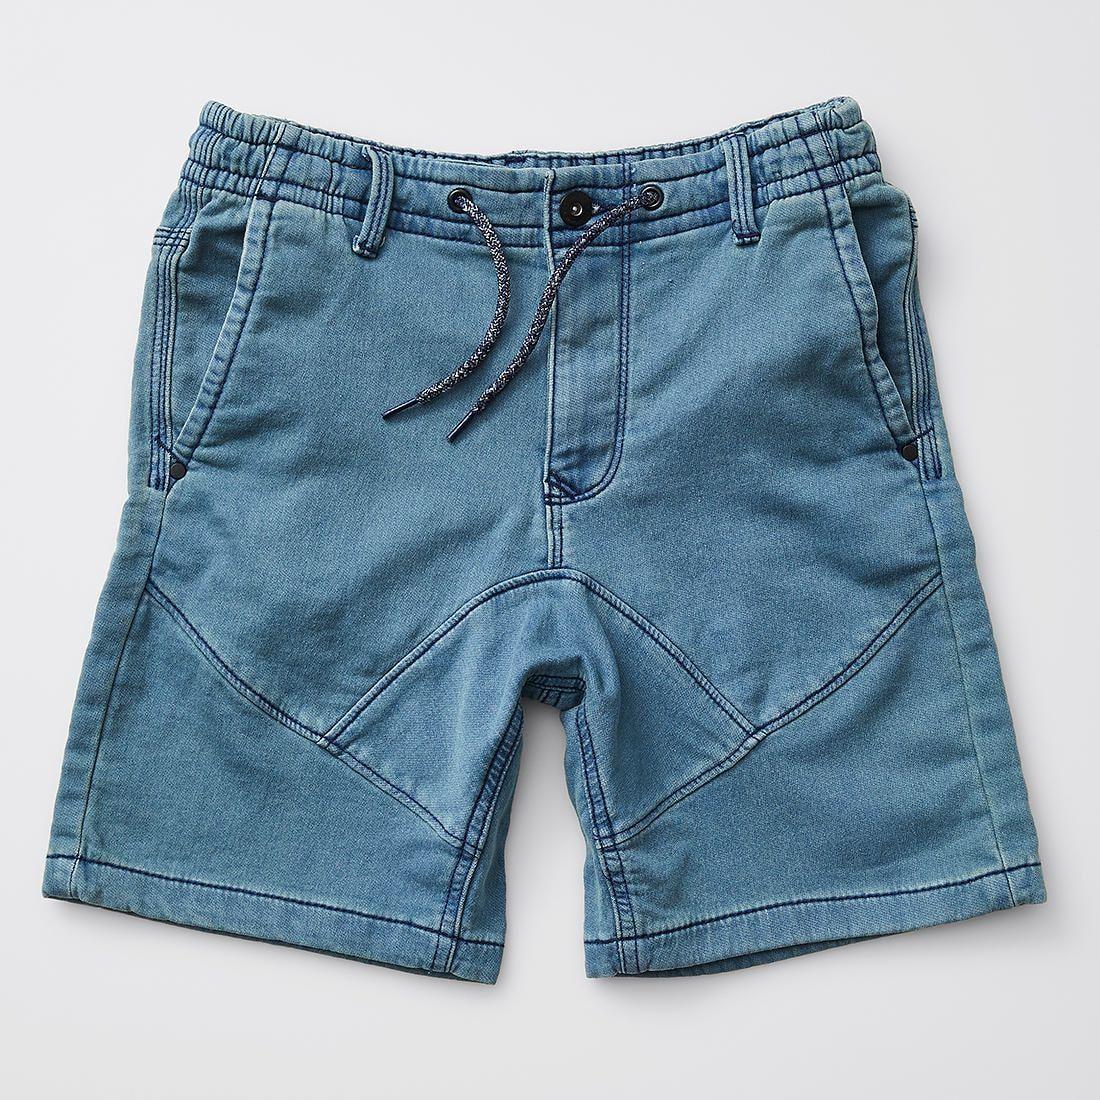 b5d71bc3afb09 Boy Shorts, Jean Shorts, Short Jeans, Teen Boys, Stretch Fabric, Elastic